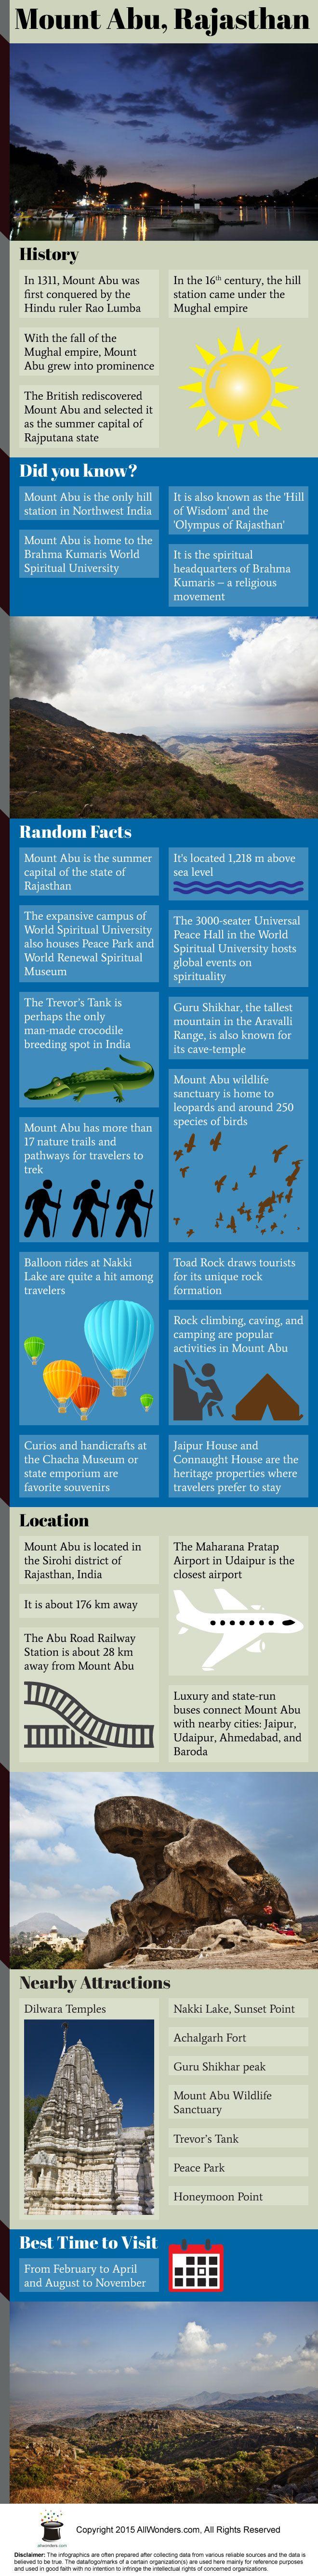 Mount Abu Infographic